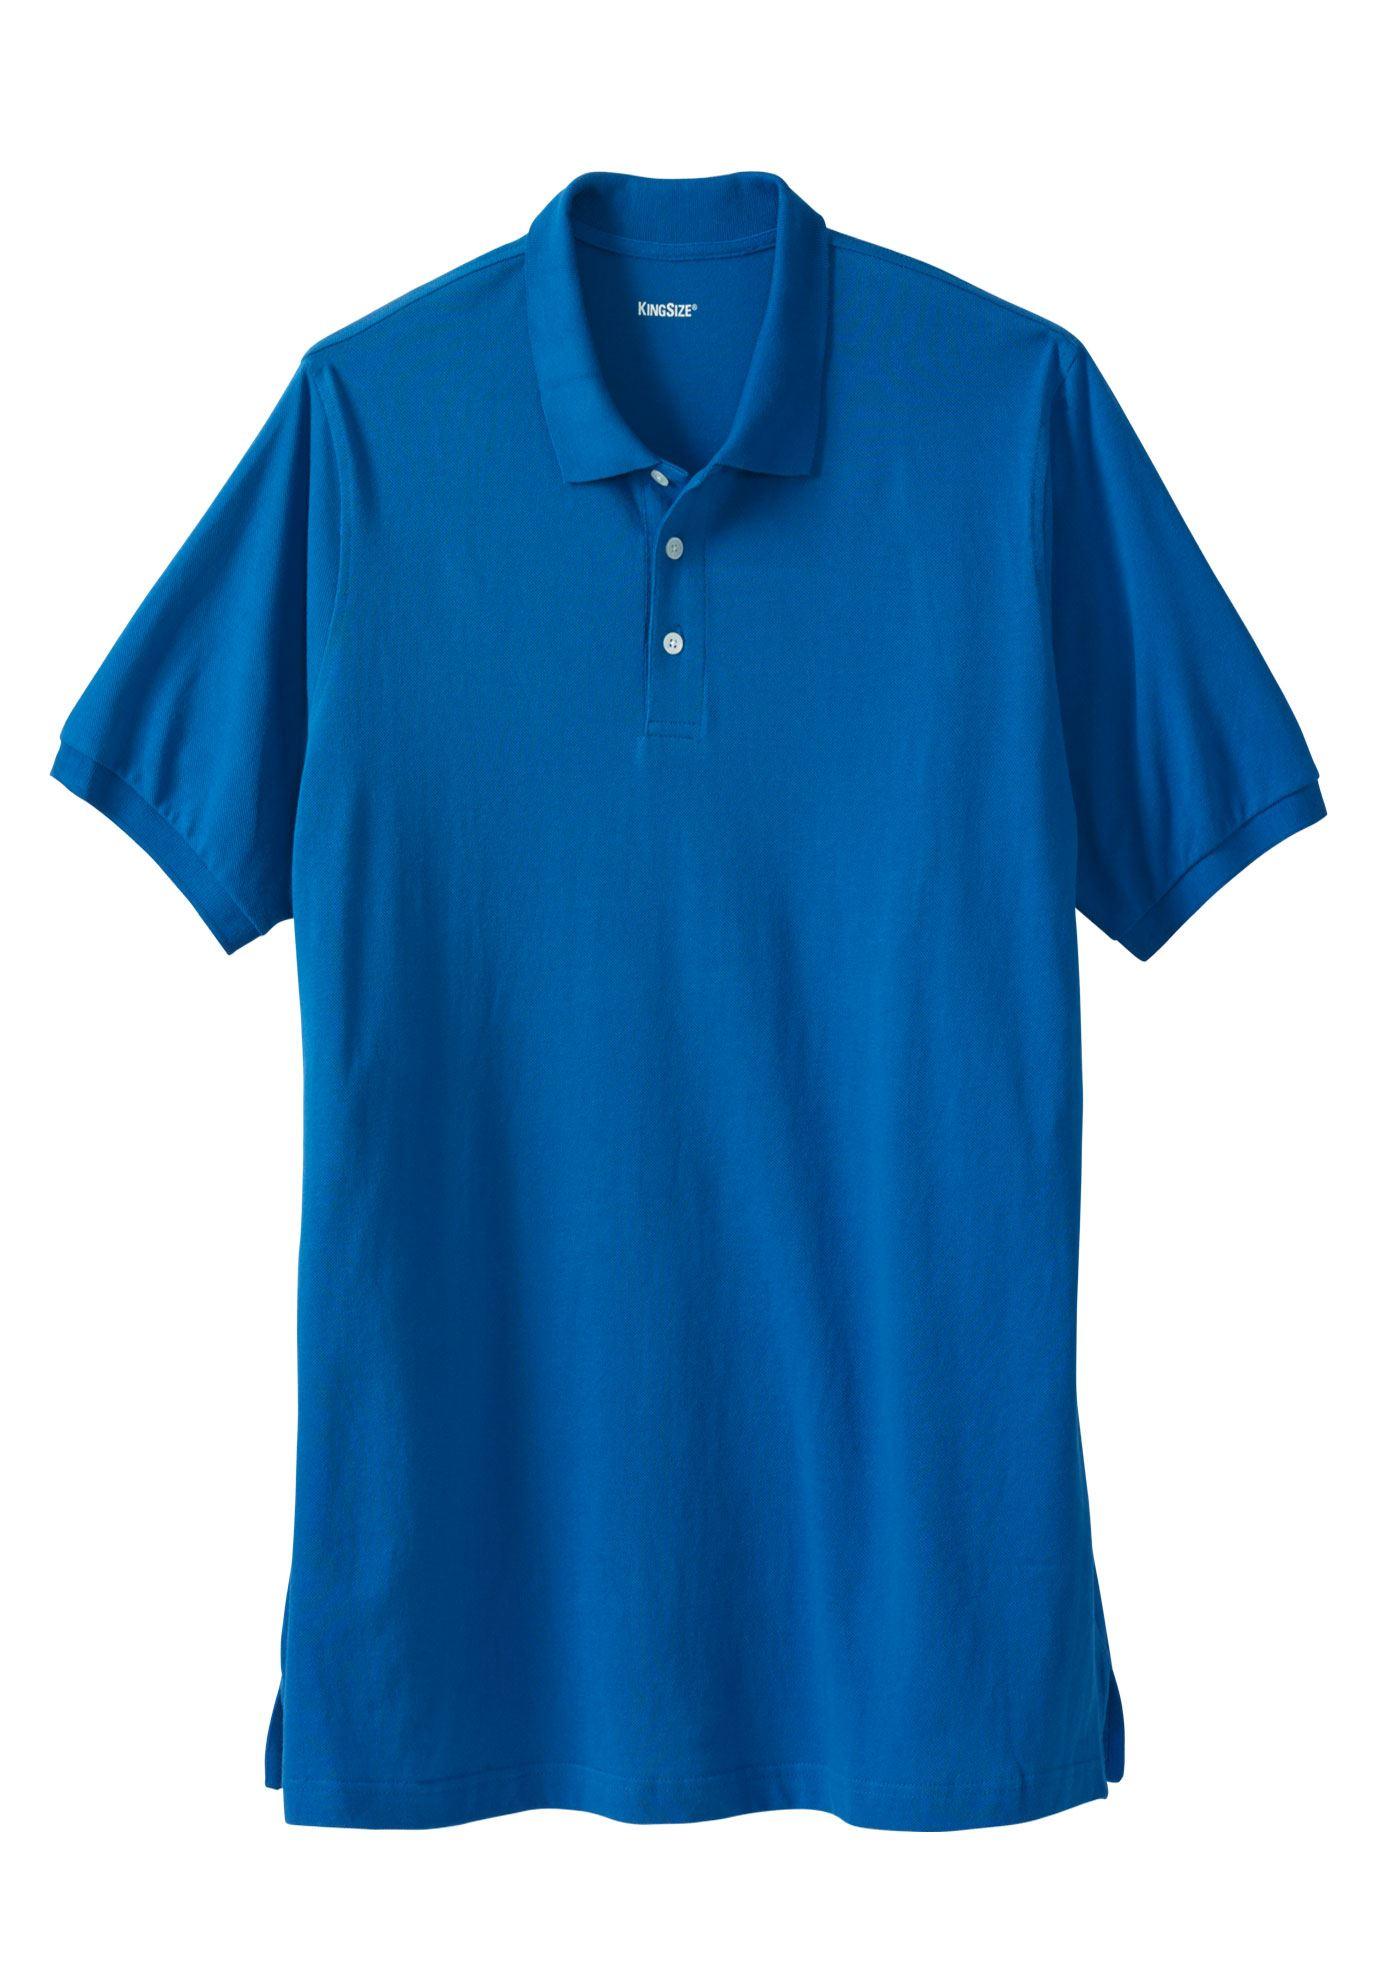 Kingsize Men's Big & Tall Longer-length Pique Polo Shirt